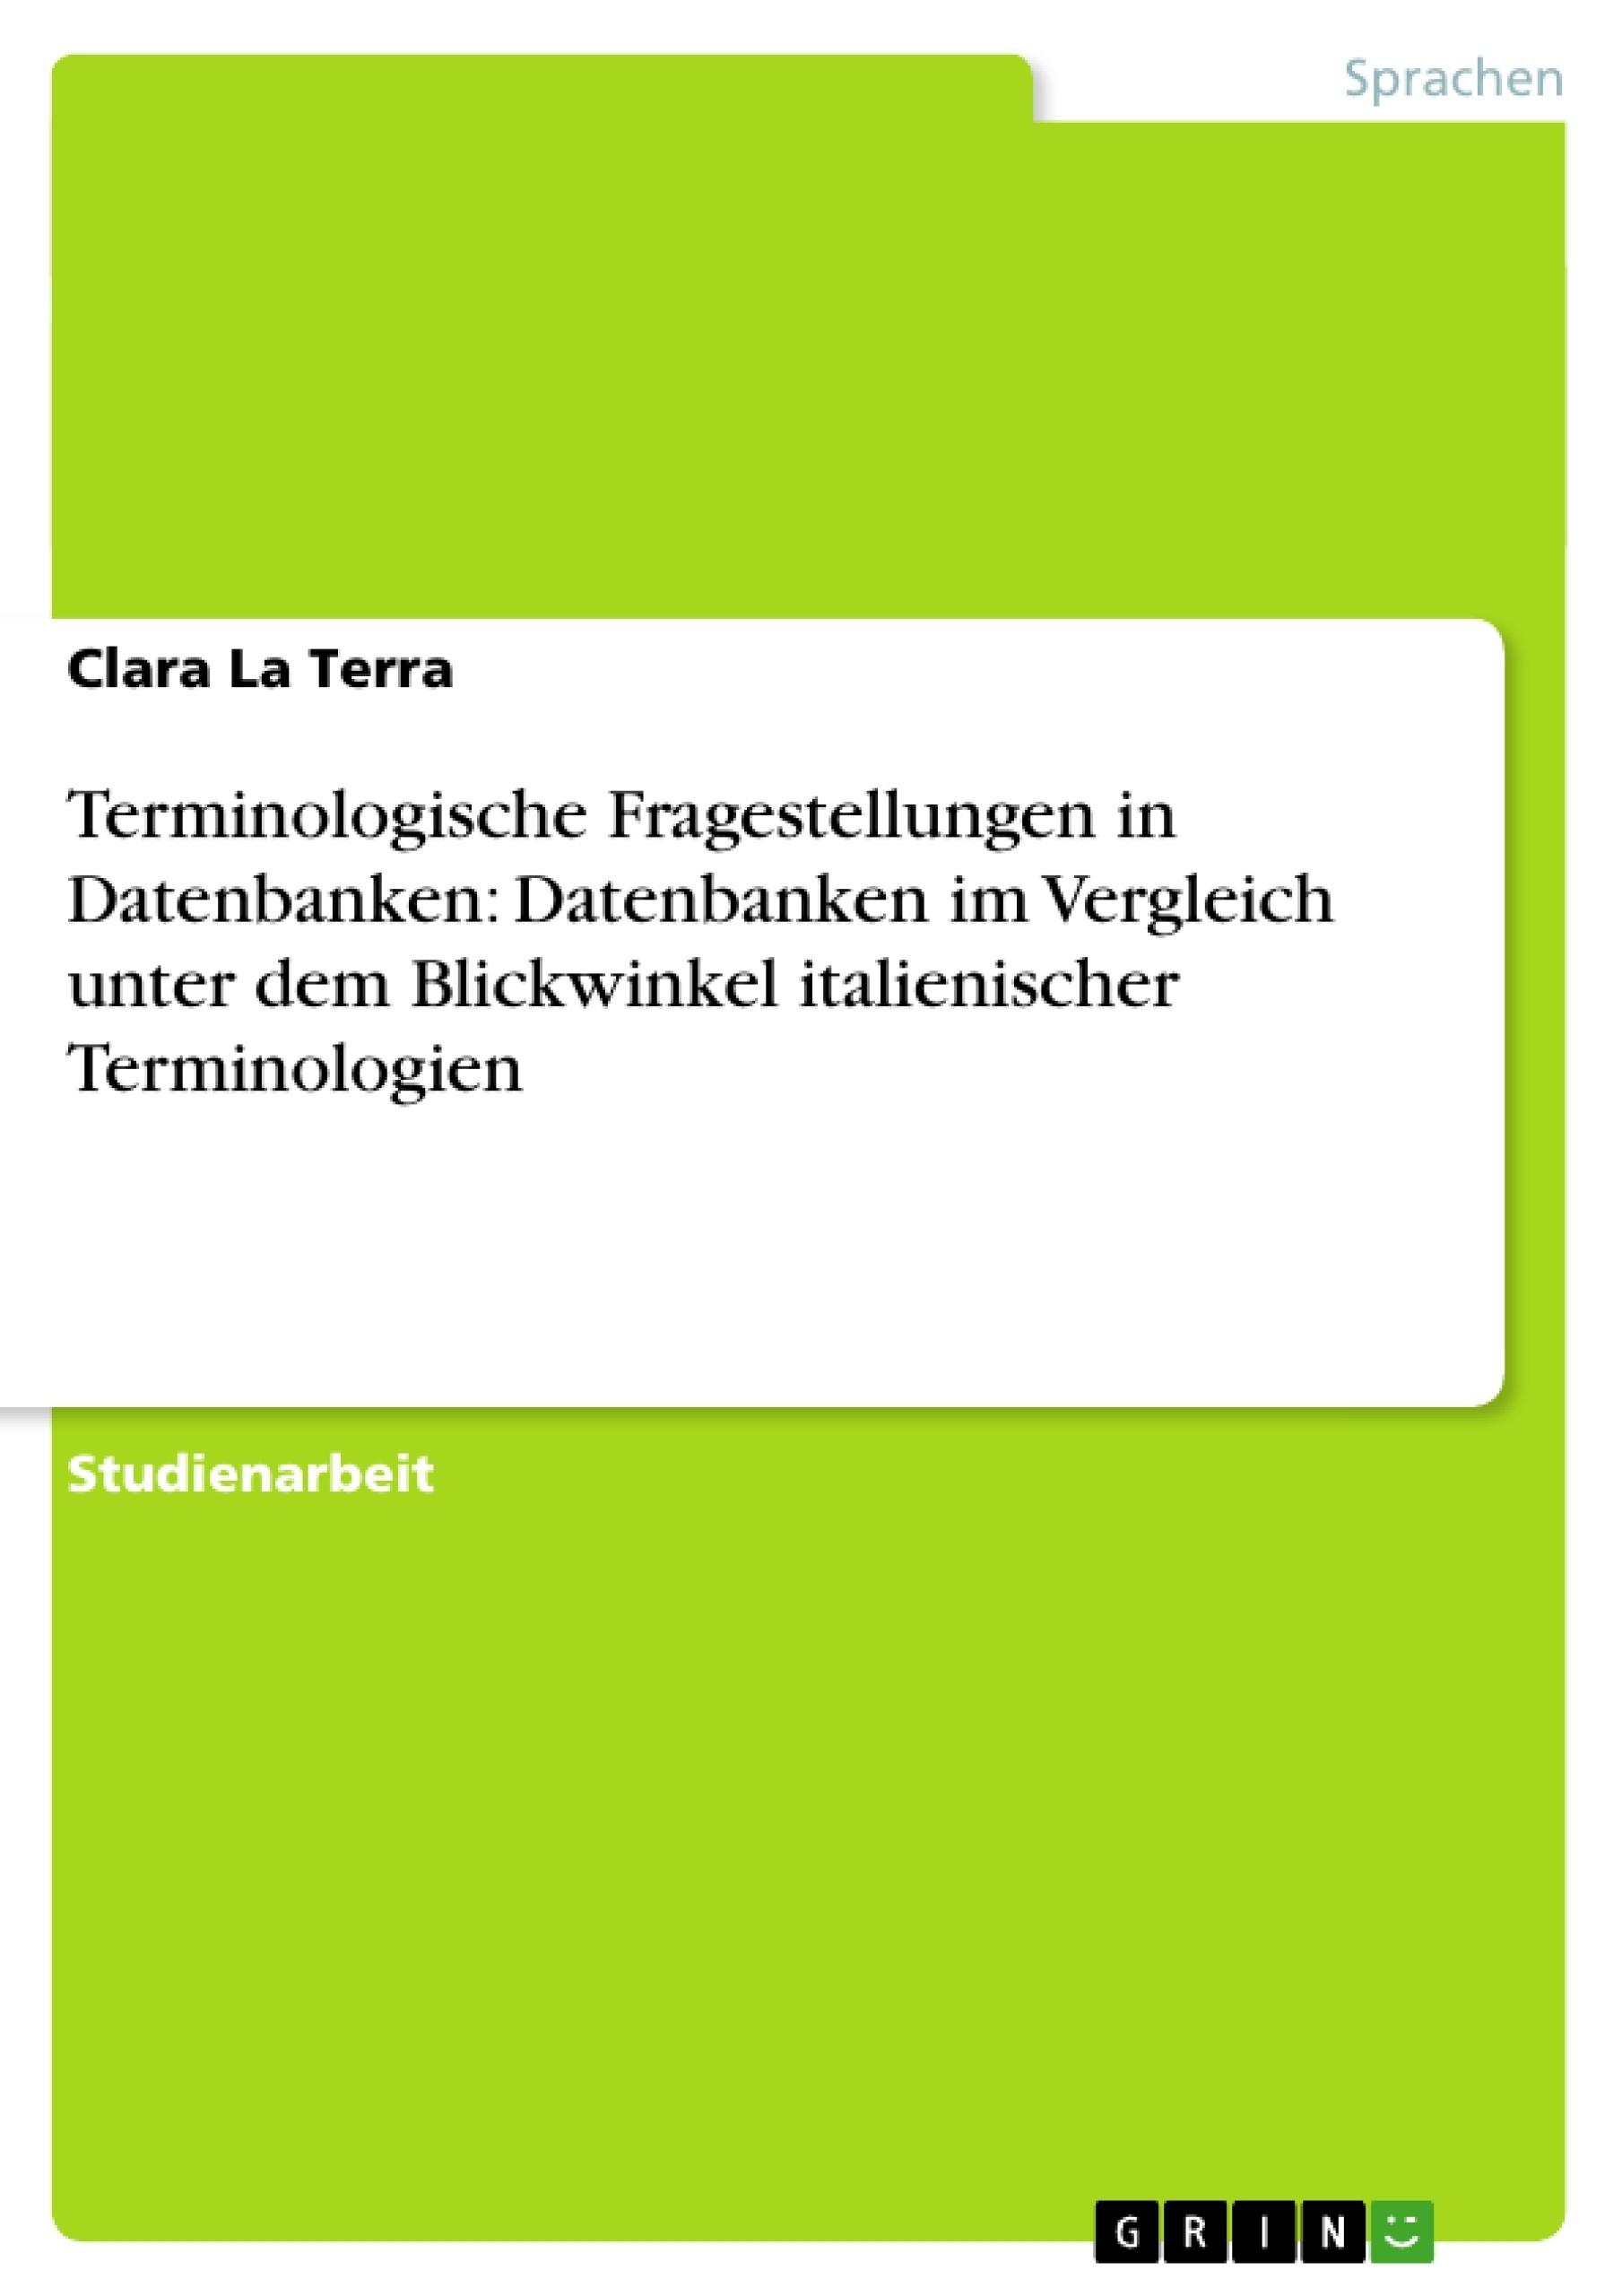 Titel: Terminologische Fragestellungen in Datenbanken: Datenbanken im Vergleich unter dem Blickwinkel italienischer Terminologien